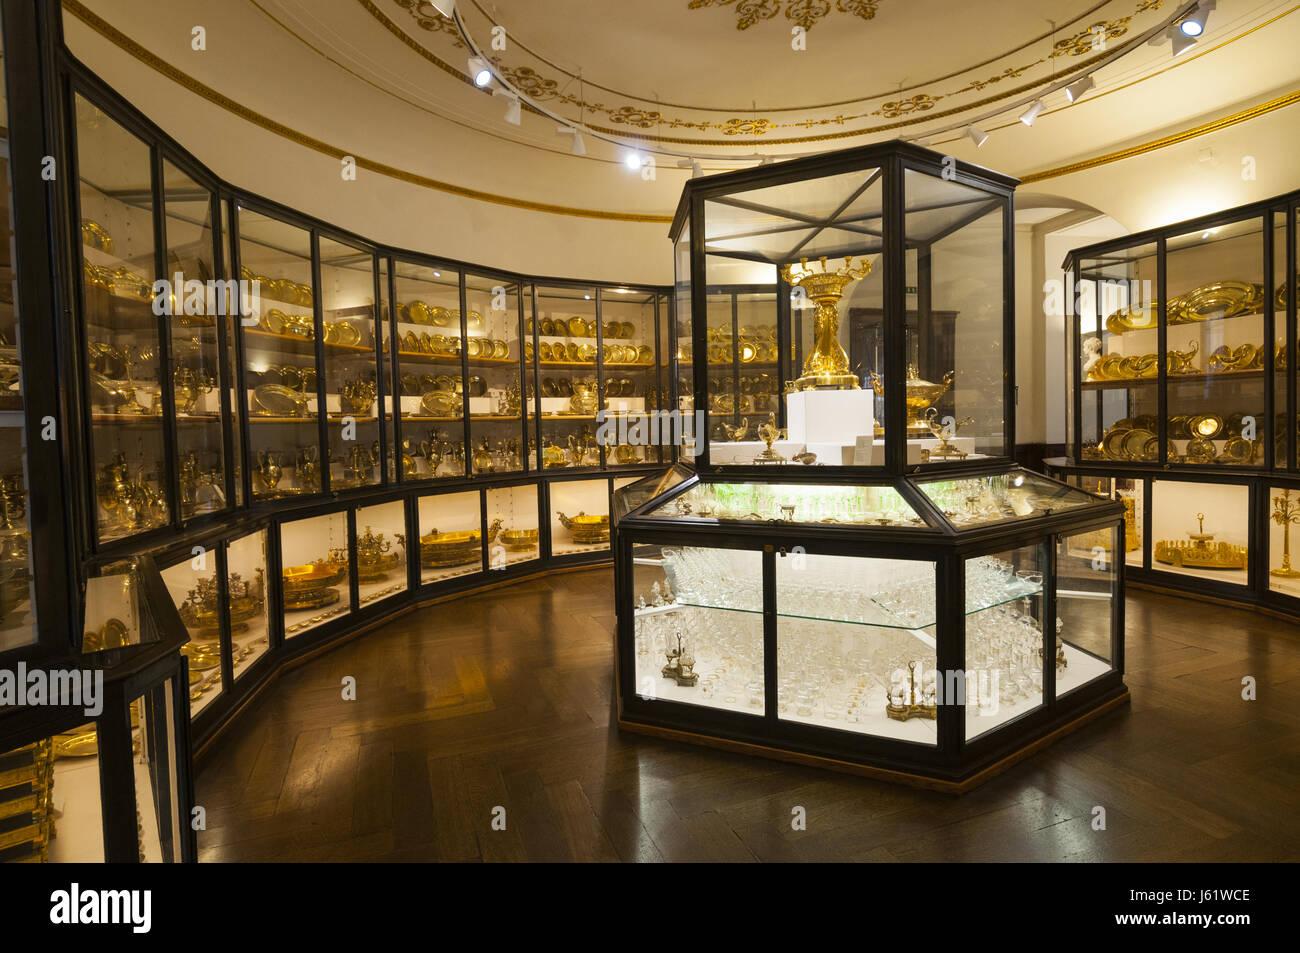 Elegant Austria, Vienna, Hofburg Imperial Palace, Imperial Apartments, Court  Tableware